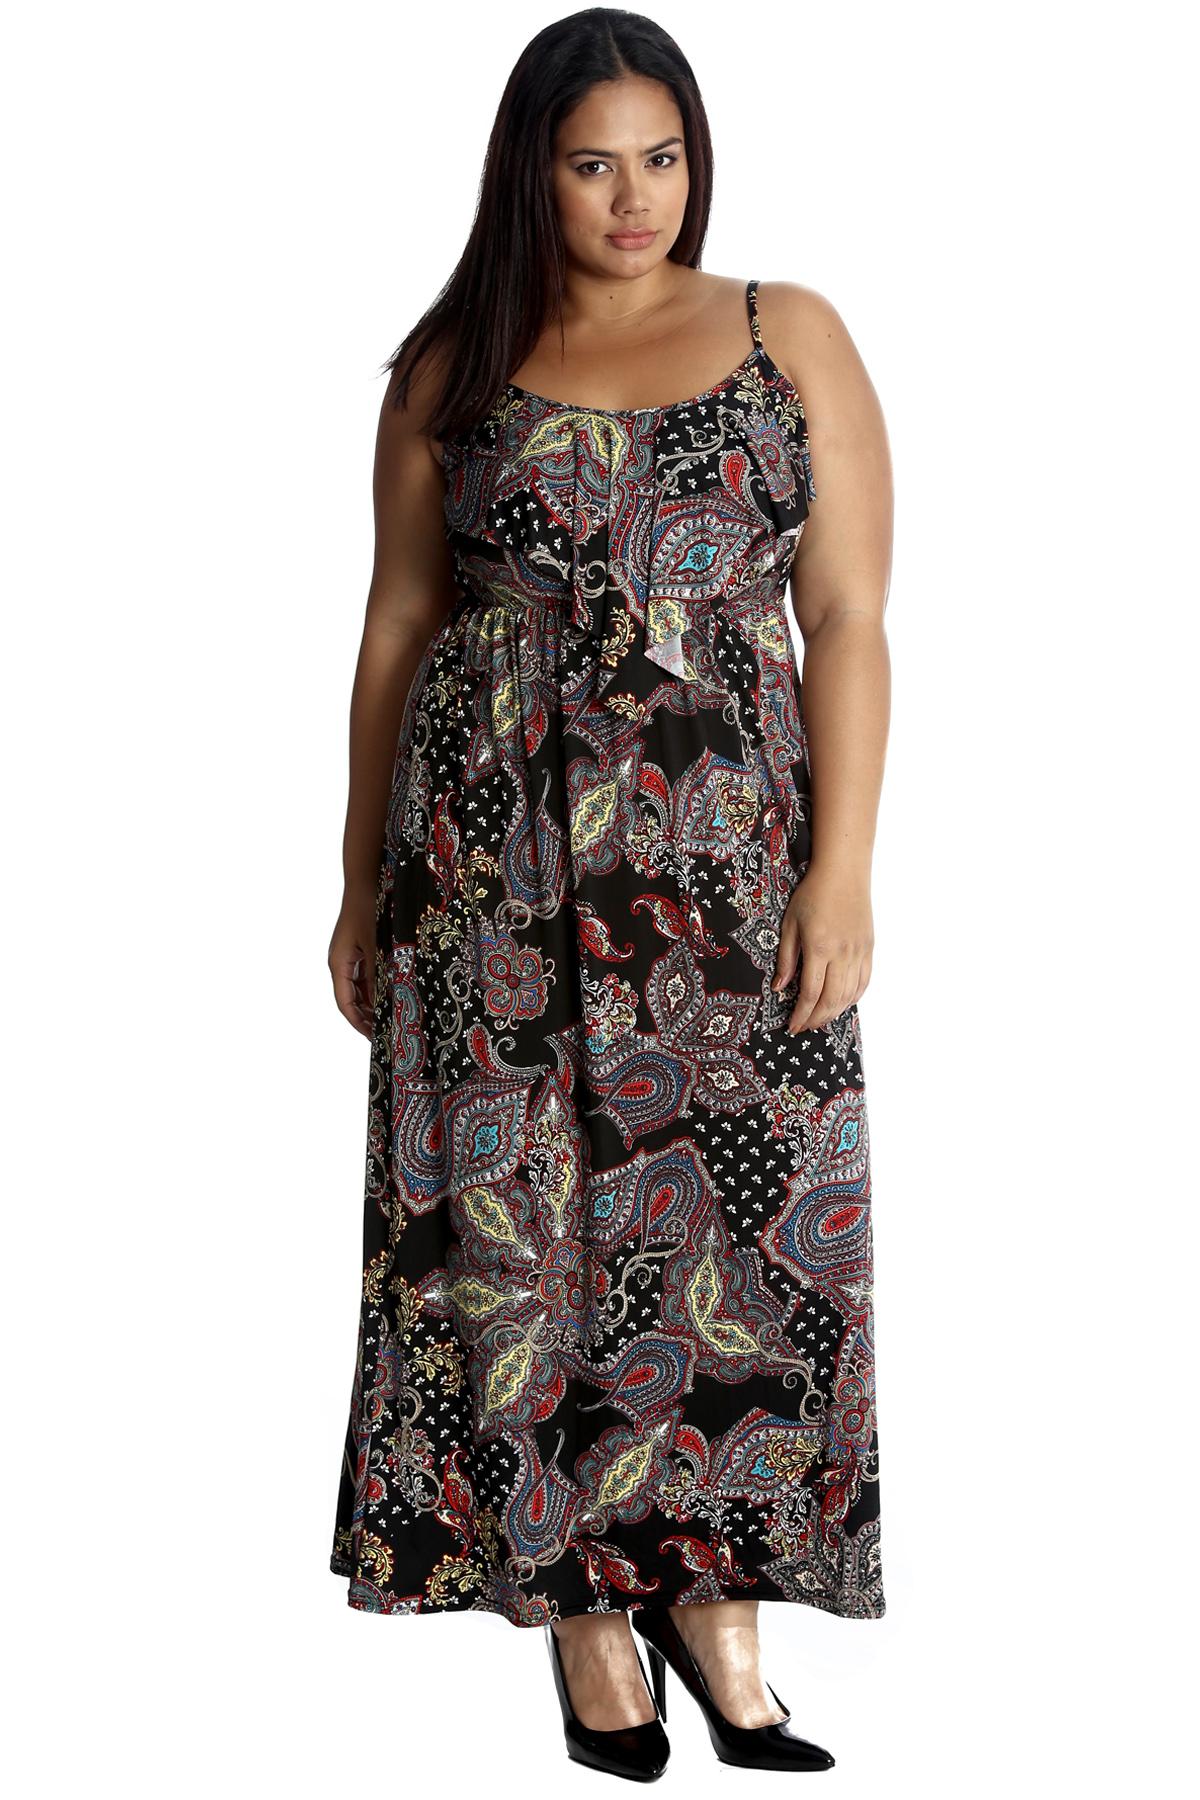 75ce018b63deb3 New Womens Plus Size Dress Maxi Ladies Paisley Floral Print Frill ...